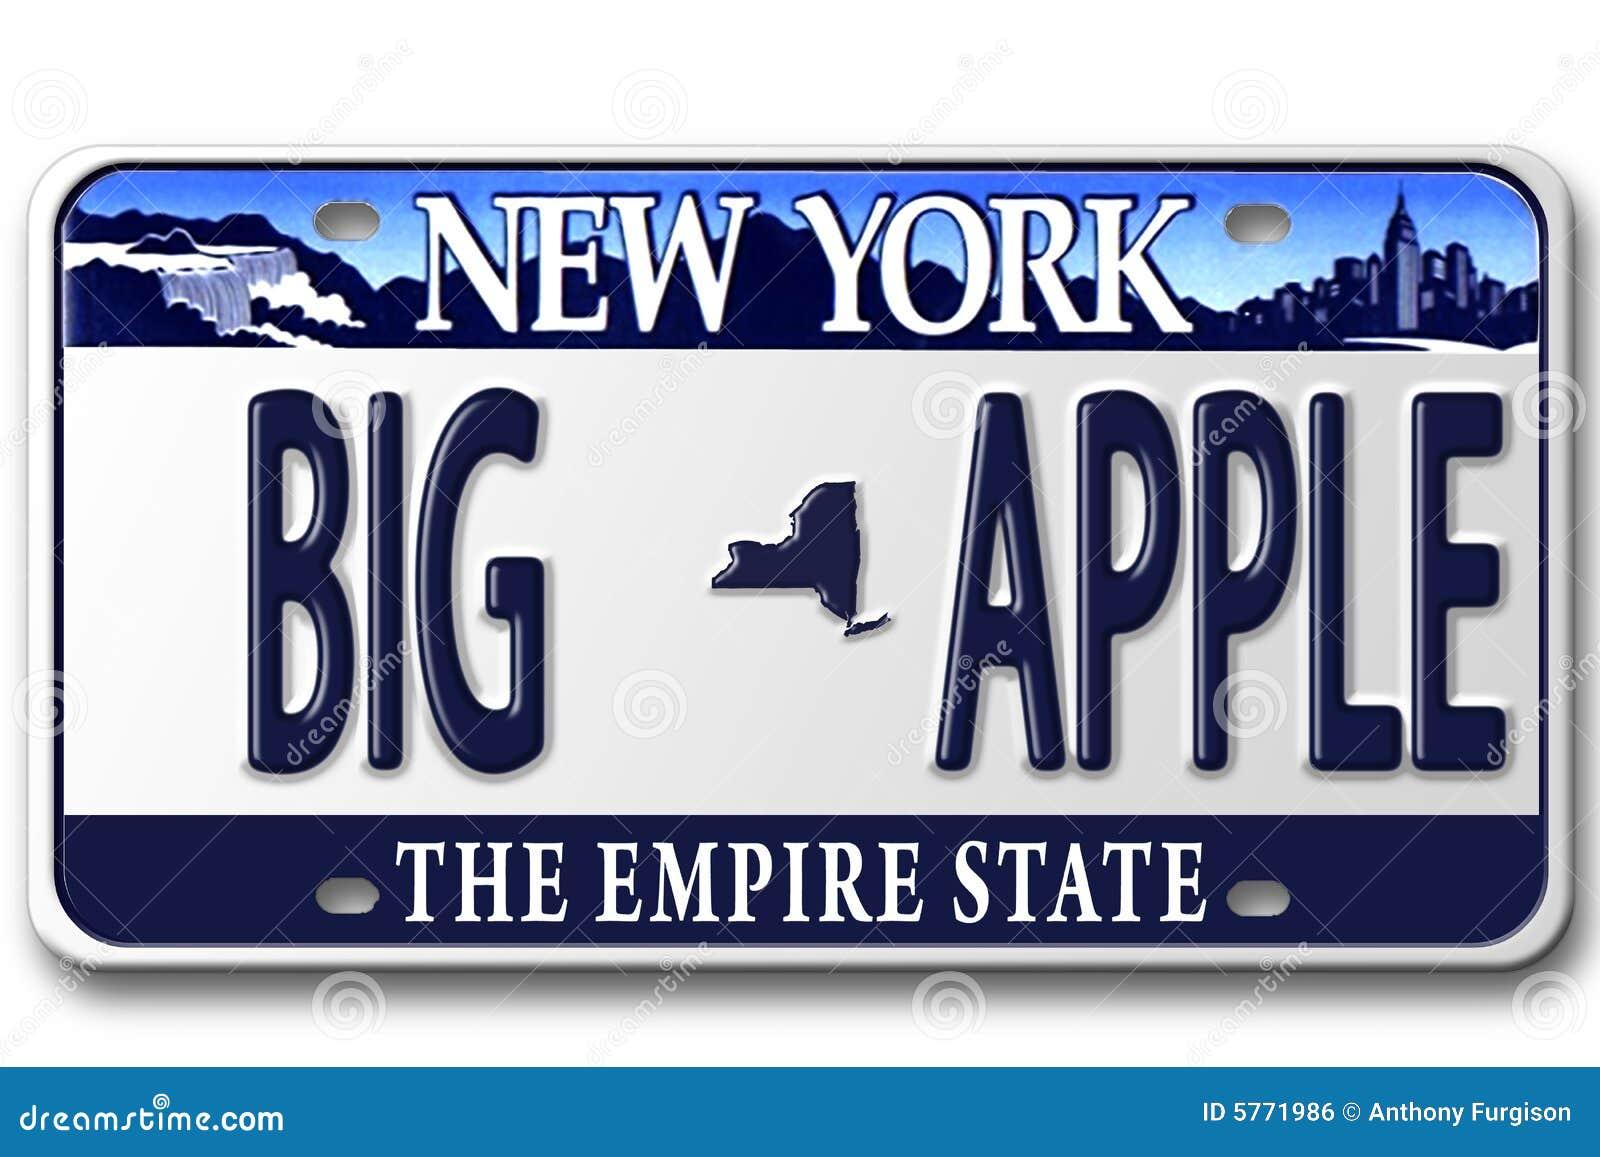 download new york license plate number search free software leaguebackup. Black Bedroom Furniture Sets. Home Design Ideas